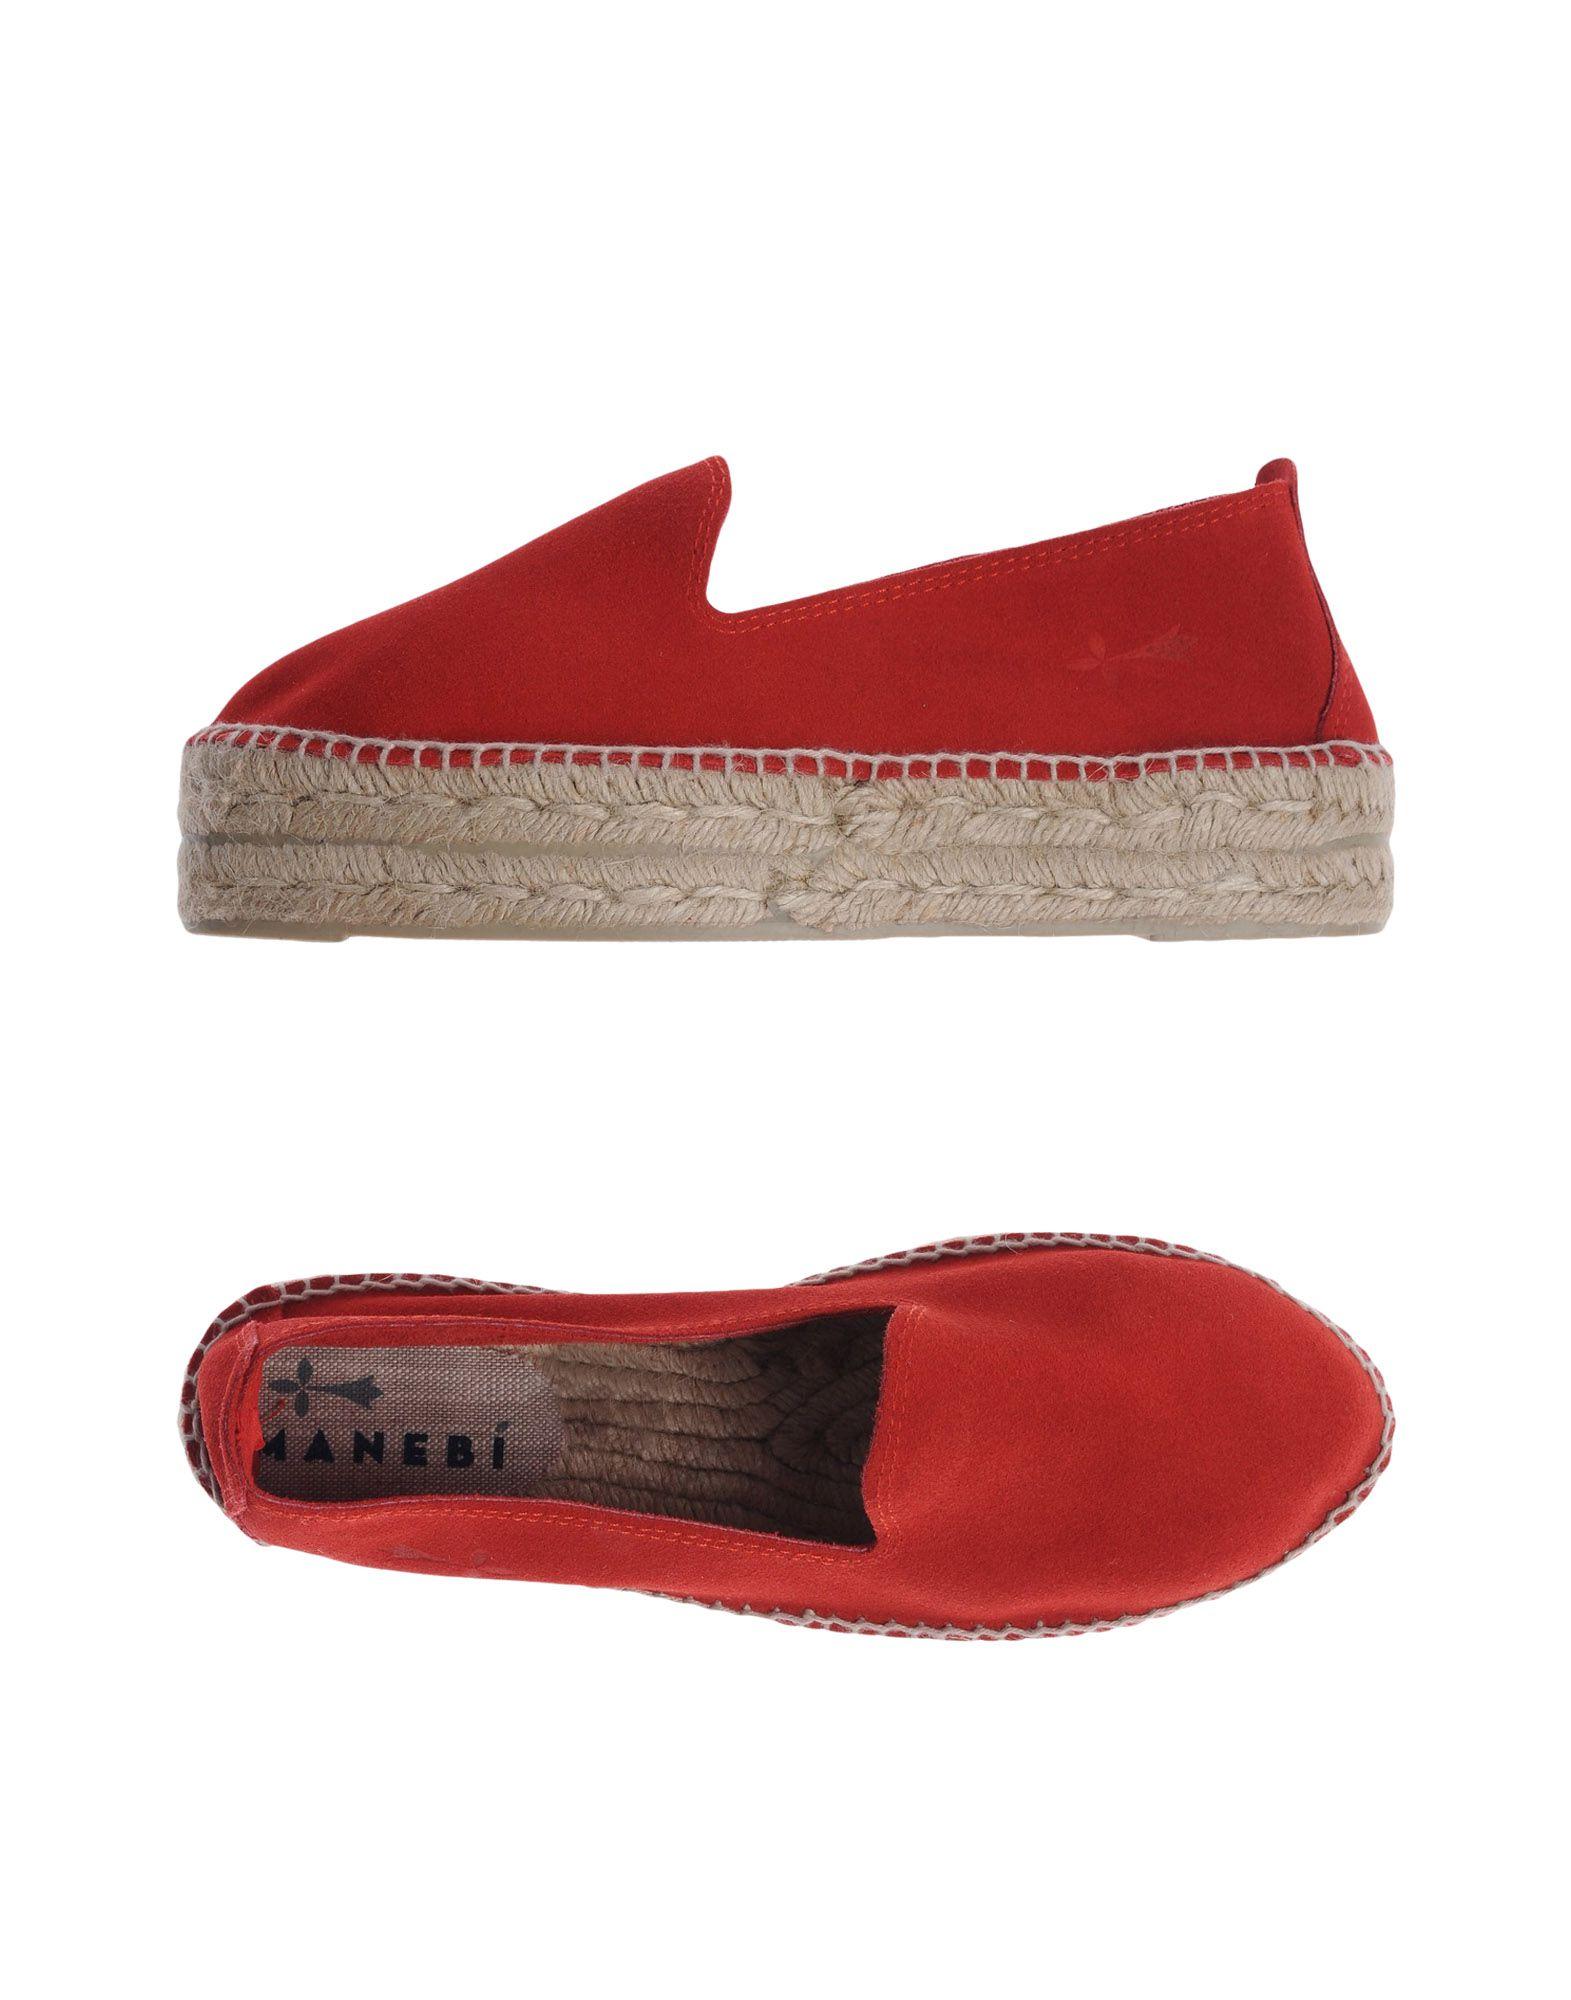 Sneakers Braccialini Donna - scarpe 11485096QF Nuove offerte e scarpe - comode 1b30ef